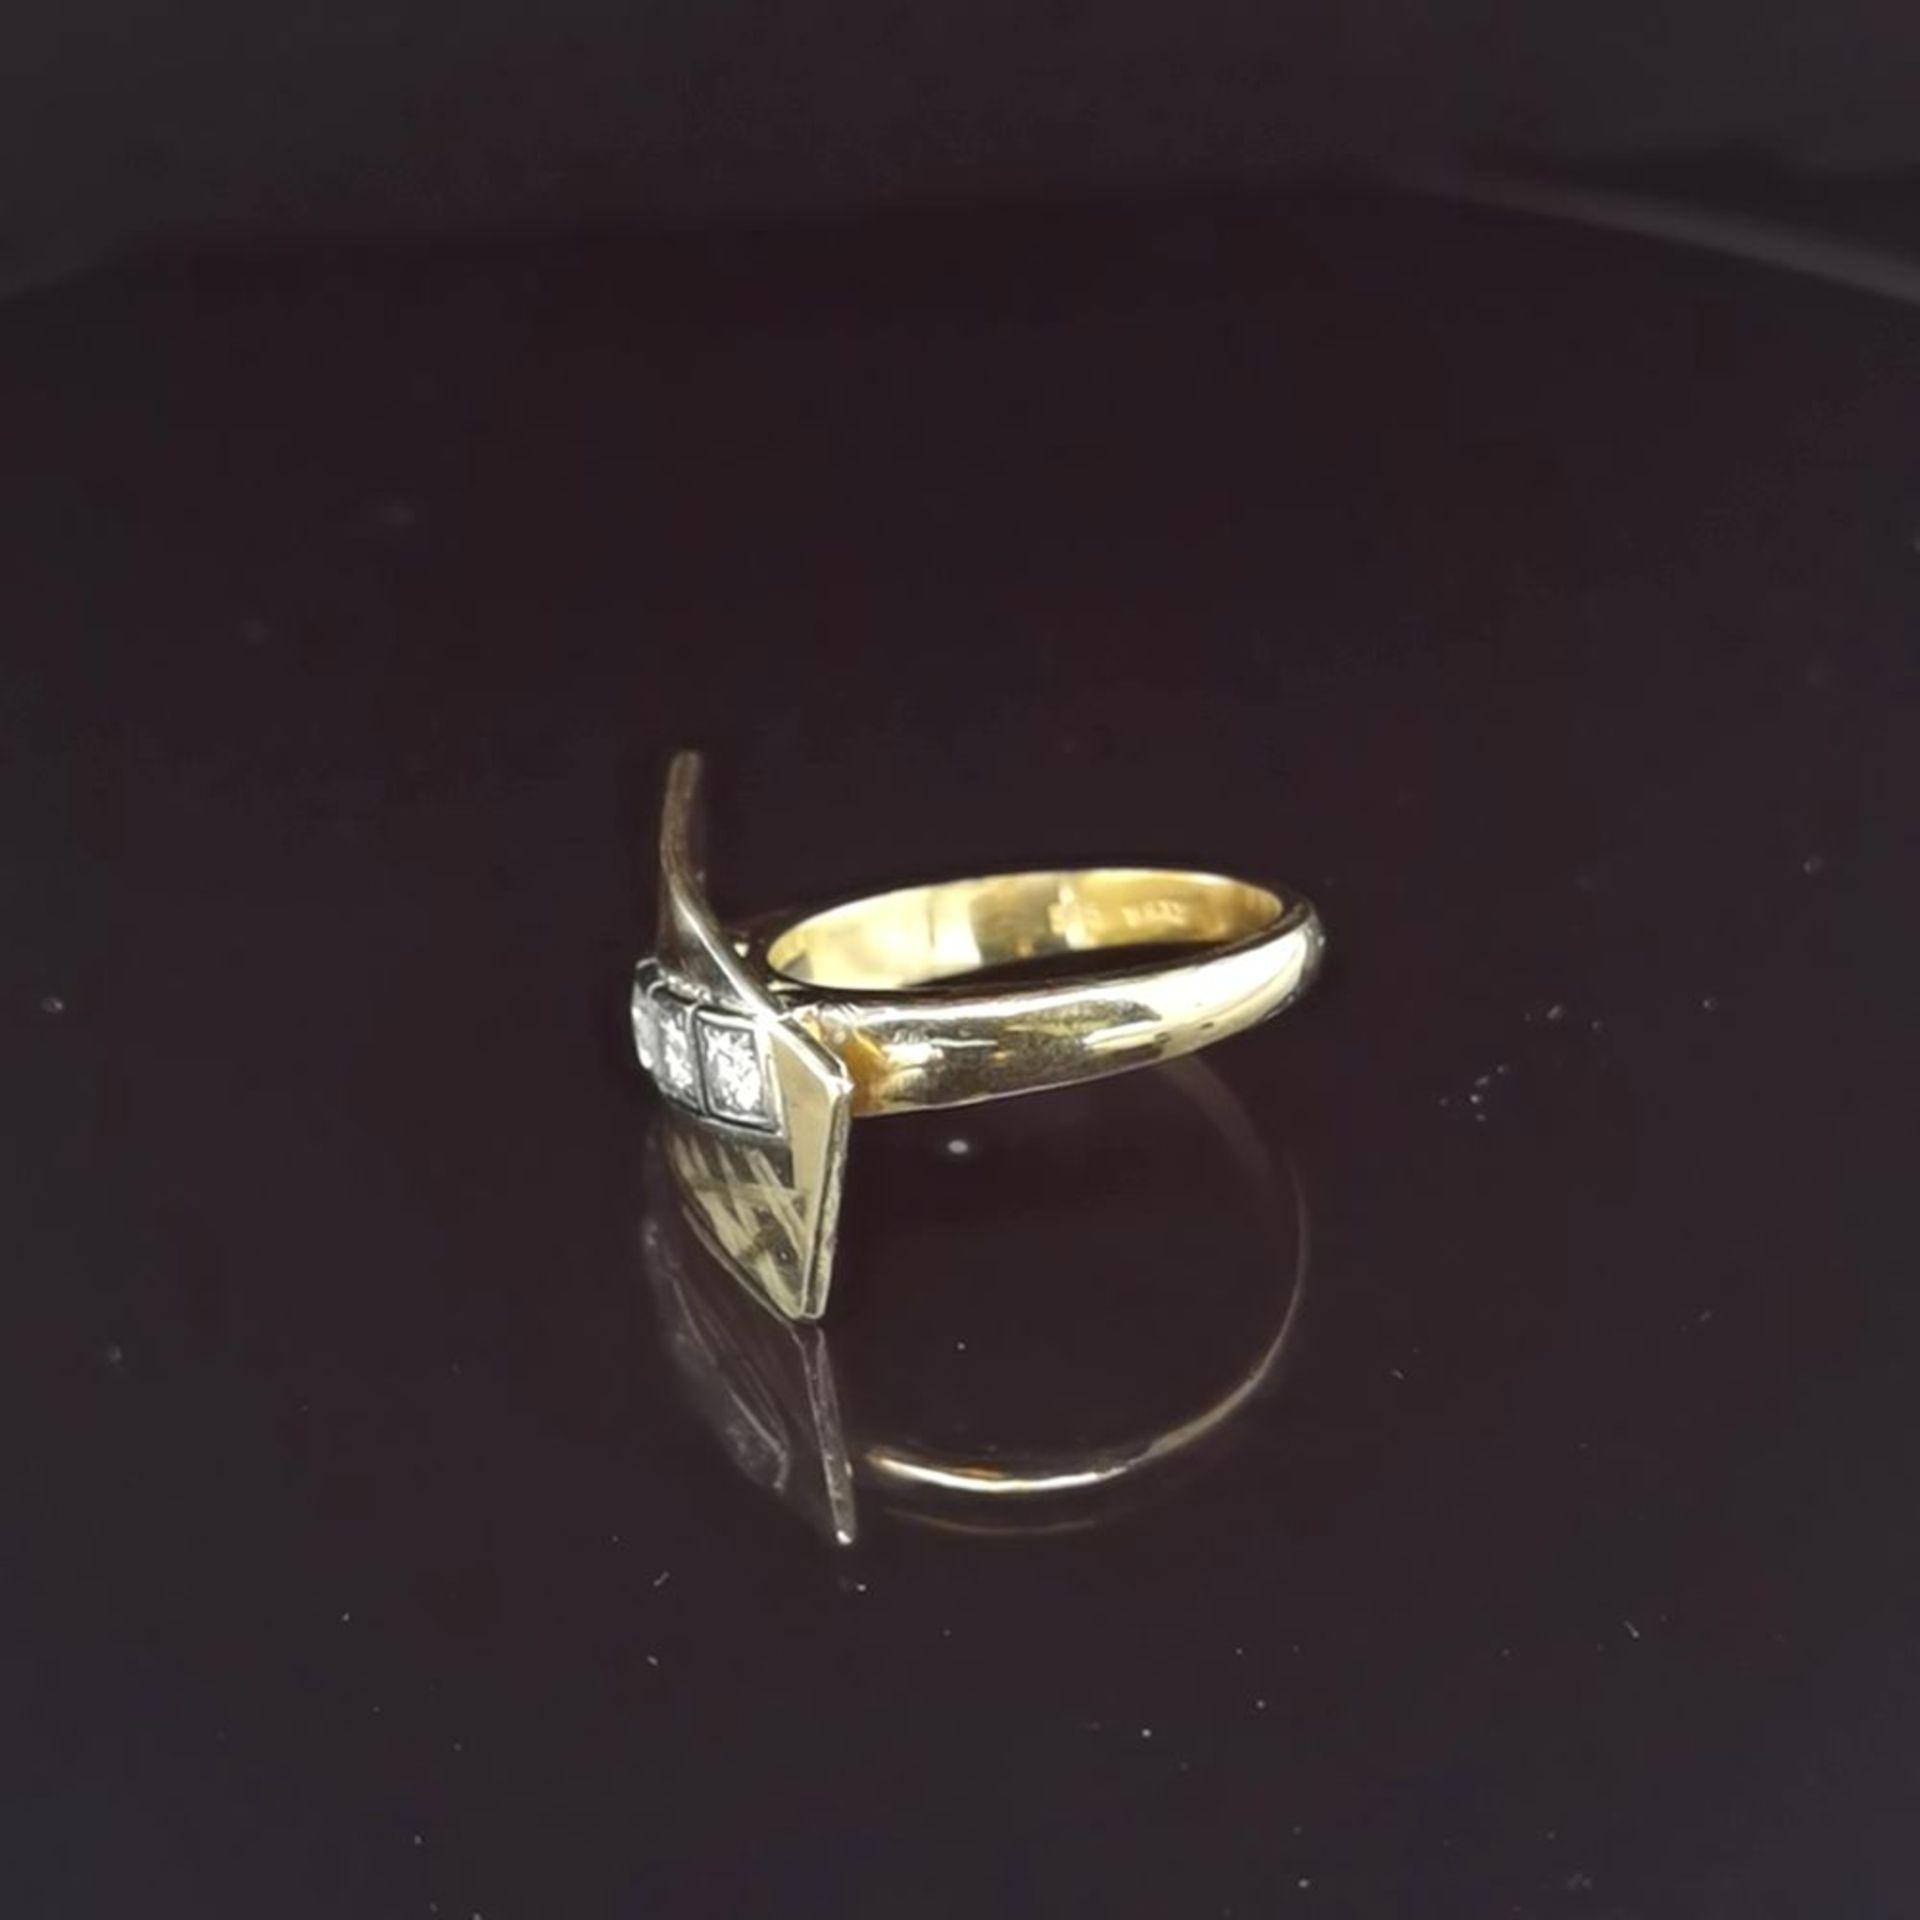 Brillant-Ring, 585 Gelbgold 7,18 - Image 2 of 3